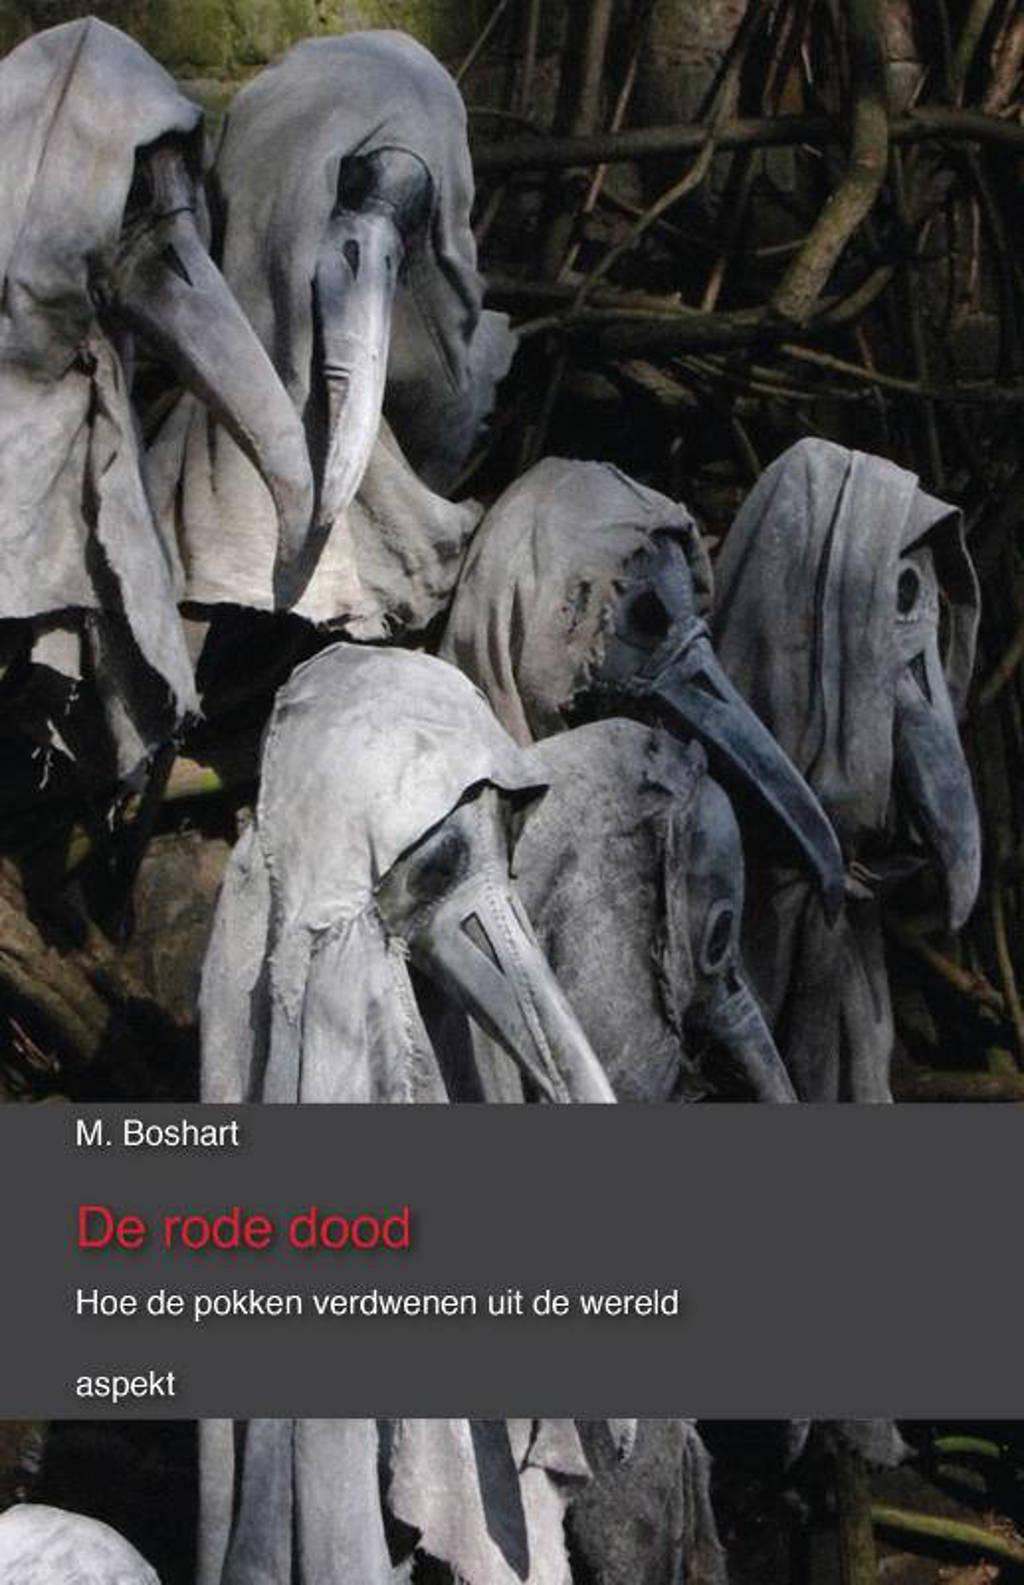 De rode dood - M. Boshart